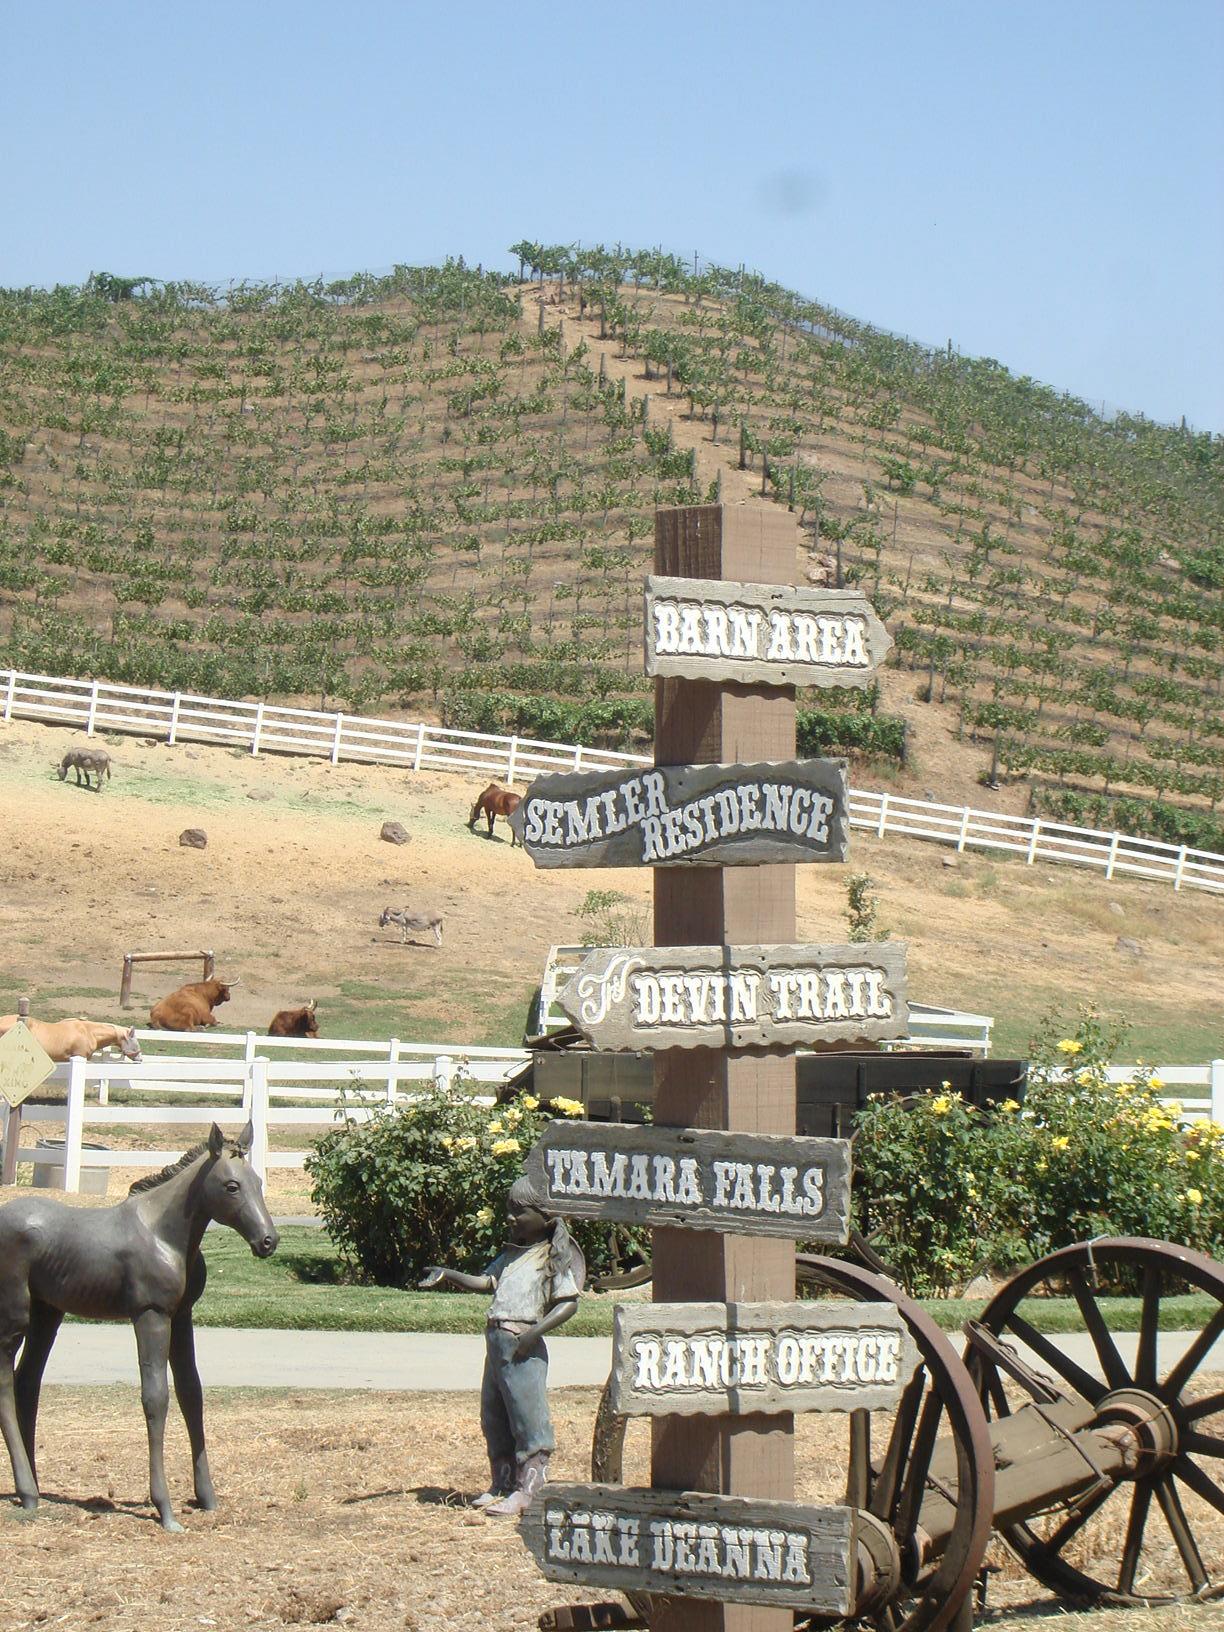 Welcome to Saddlerock